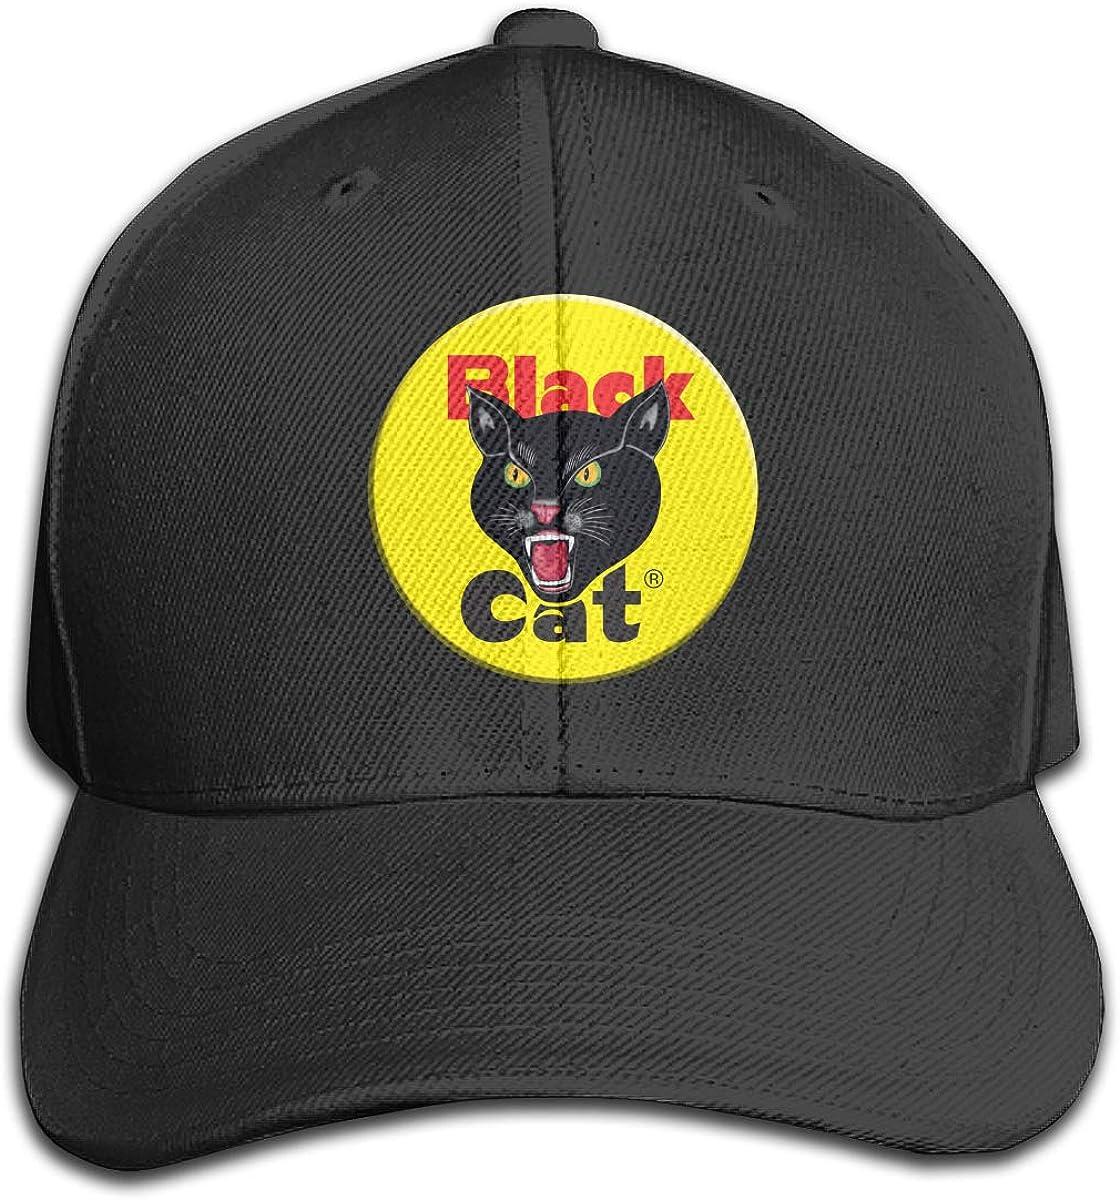 Black Cat Fireworks Trucker Hat 4th of July Vintage 80's Style Snapback Black